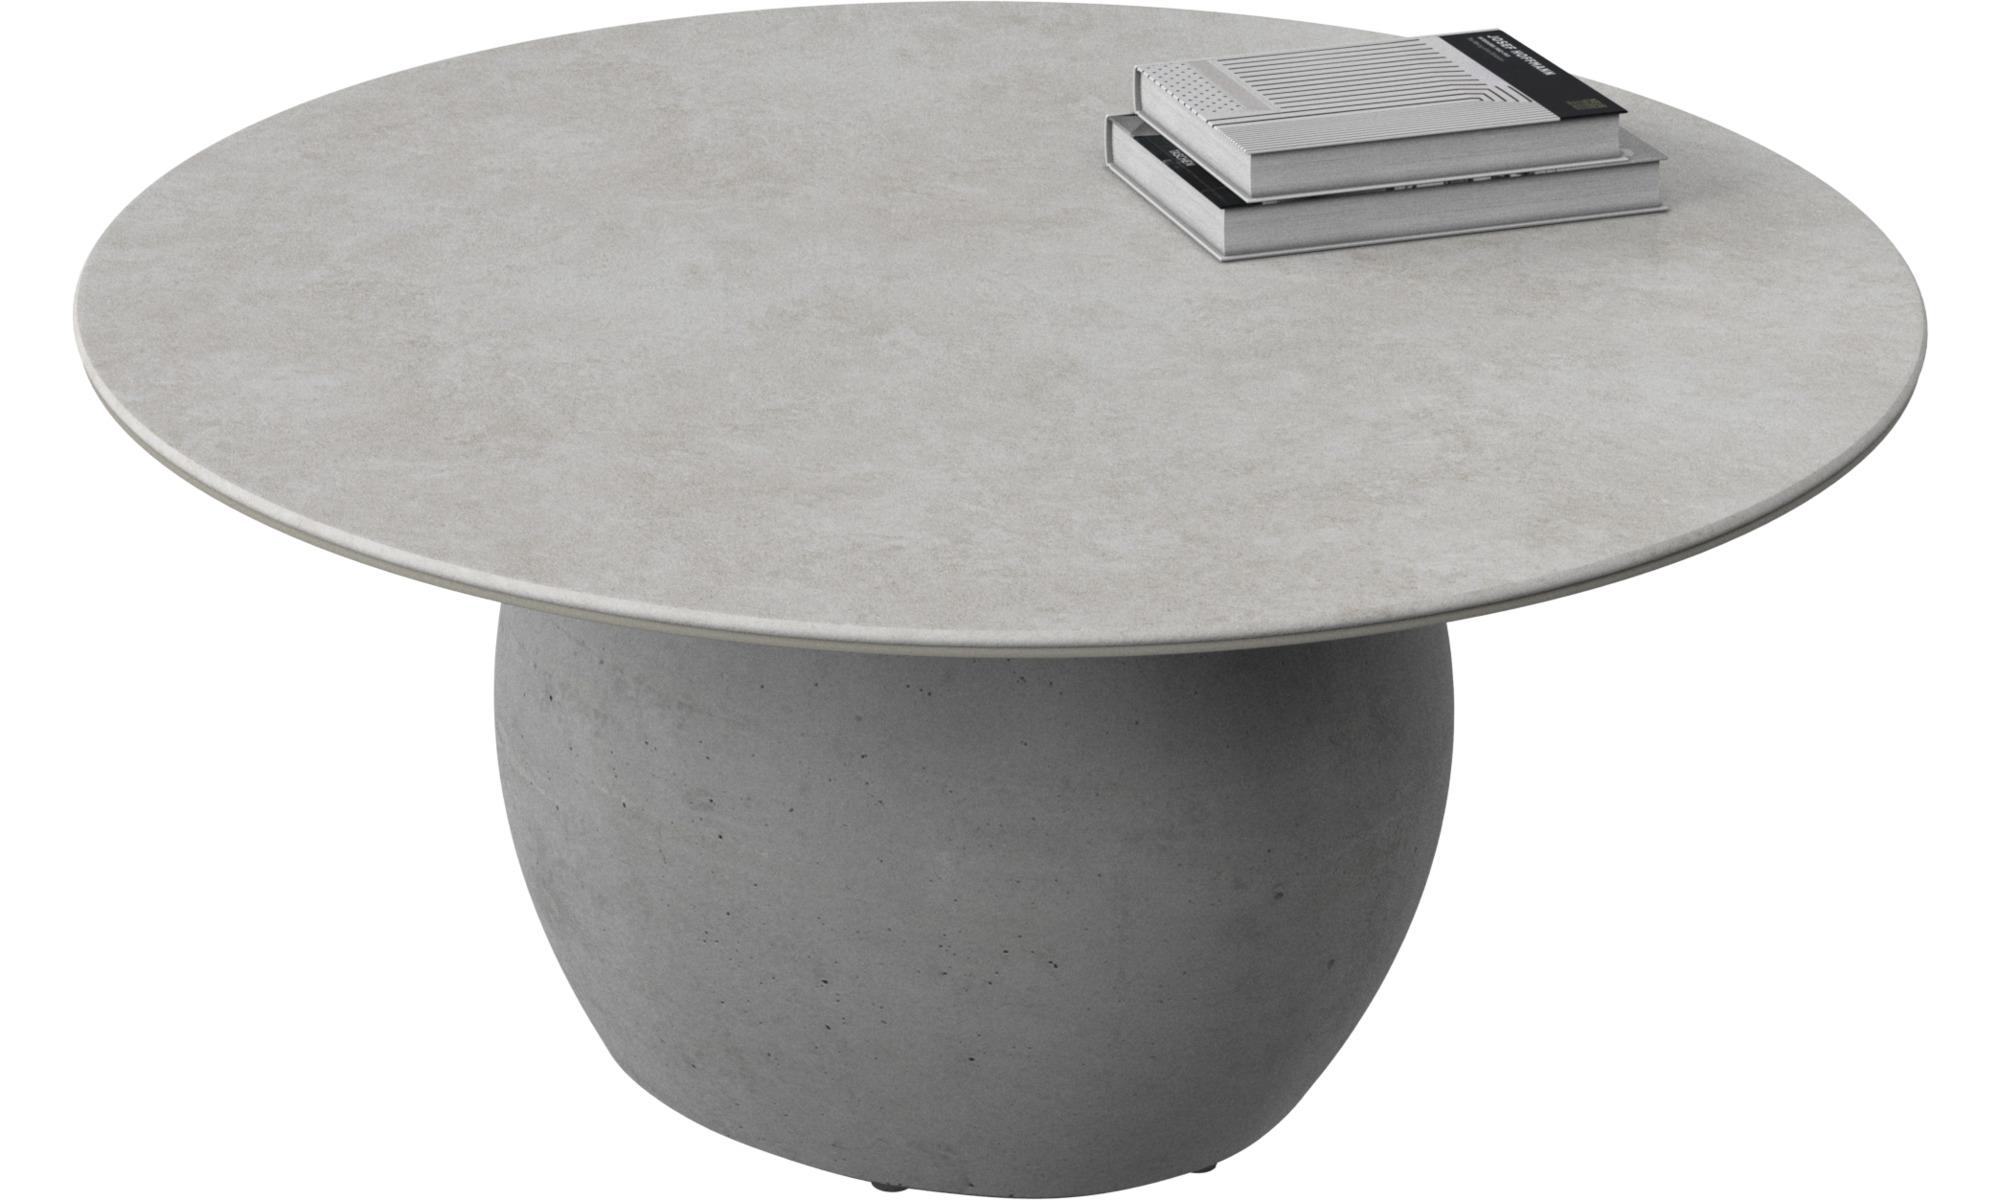 - Coffee Tables - Bilbao Coffee Table - BoConcept